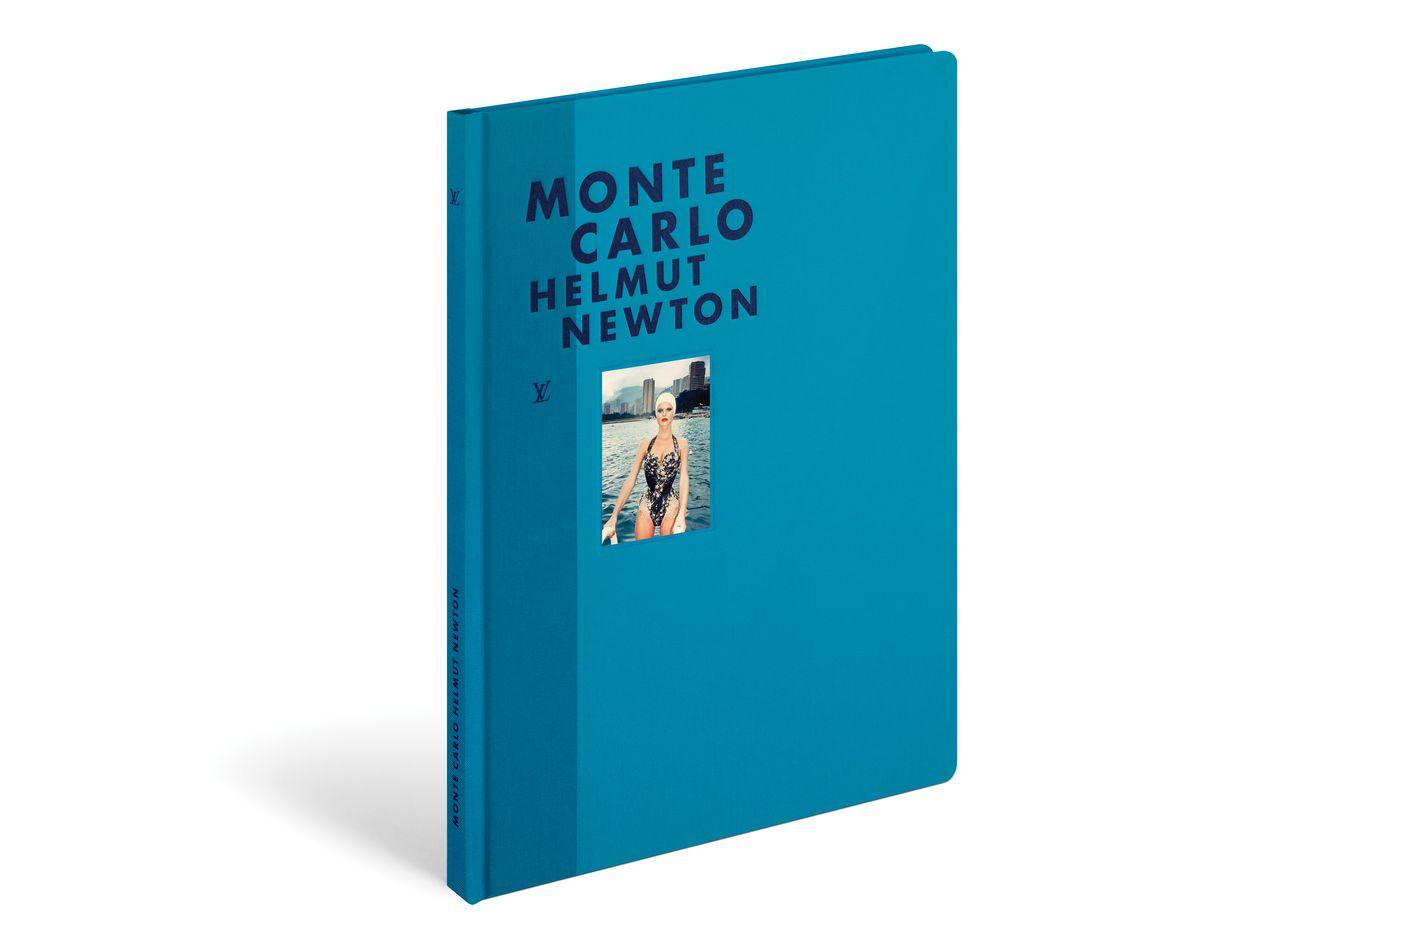 Monte Carlo by Helmut Newton